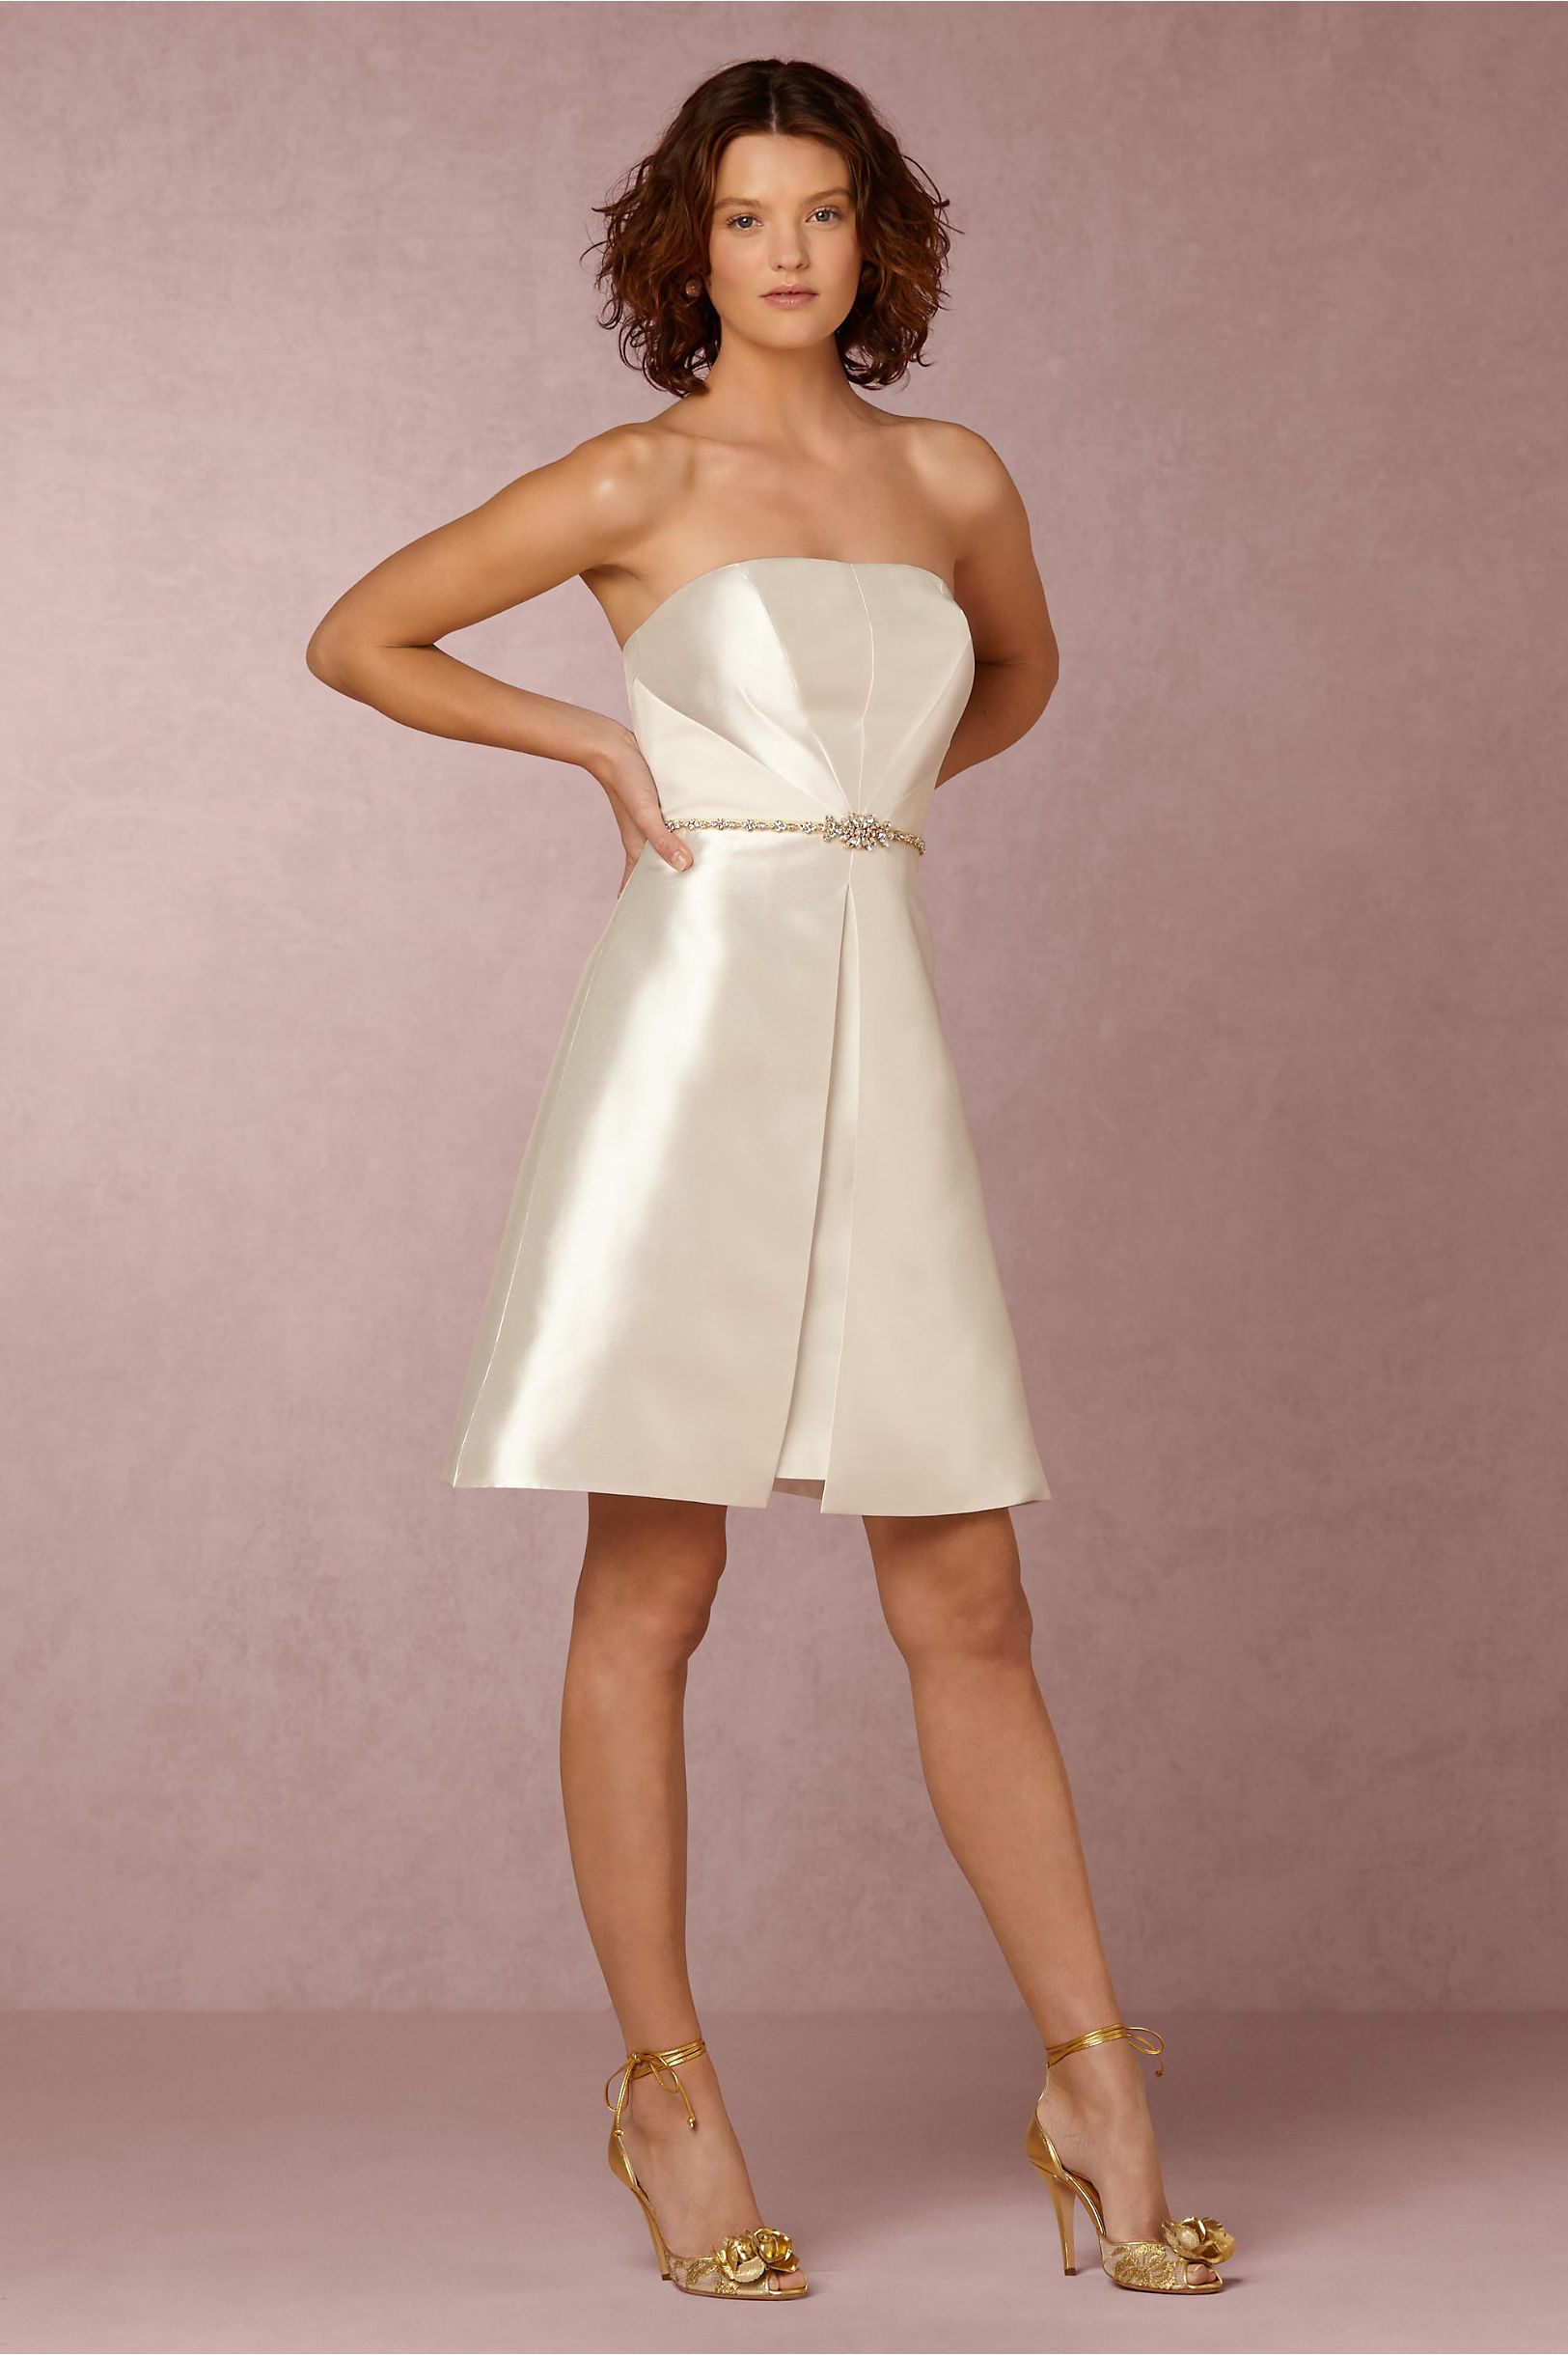 Lux Dress in Bride | BHLDN